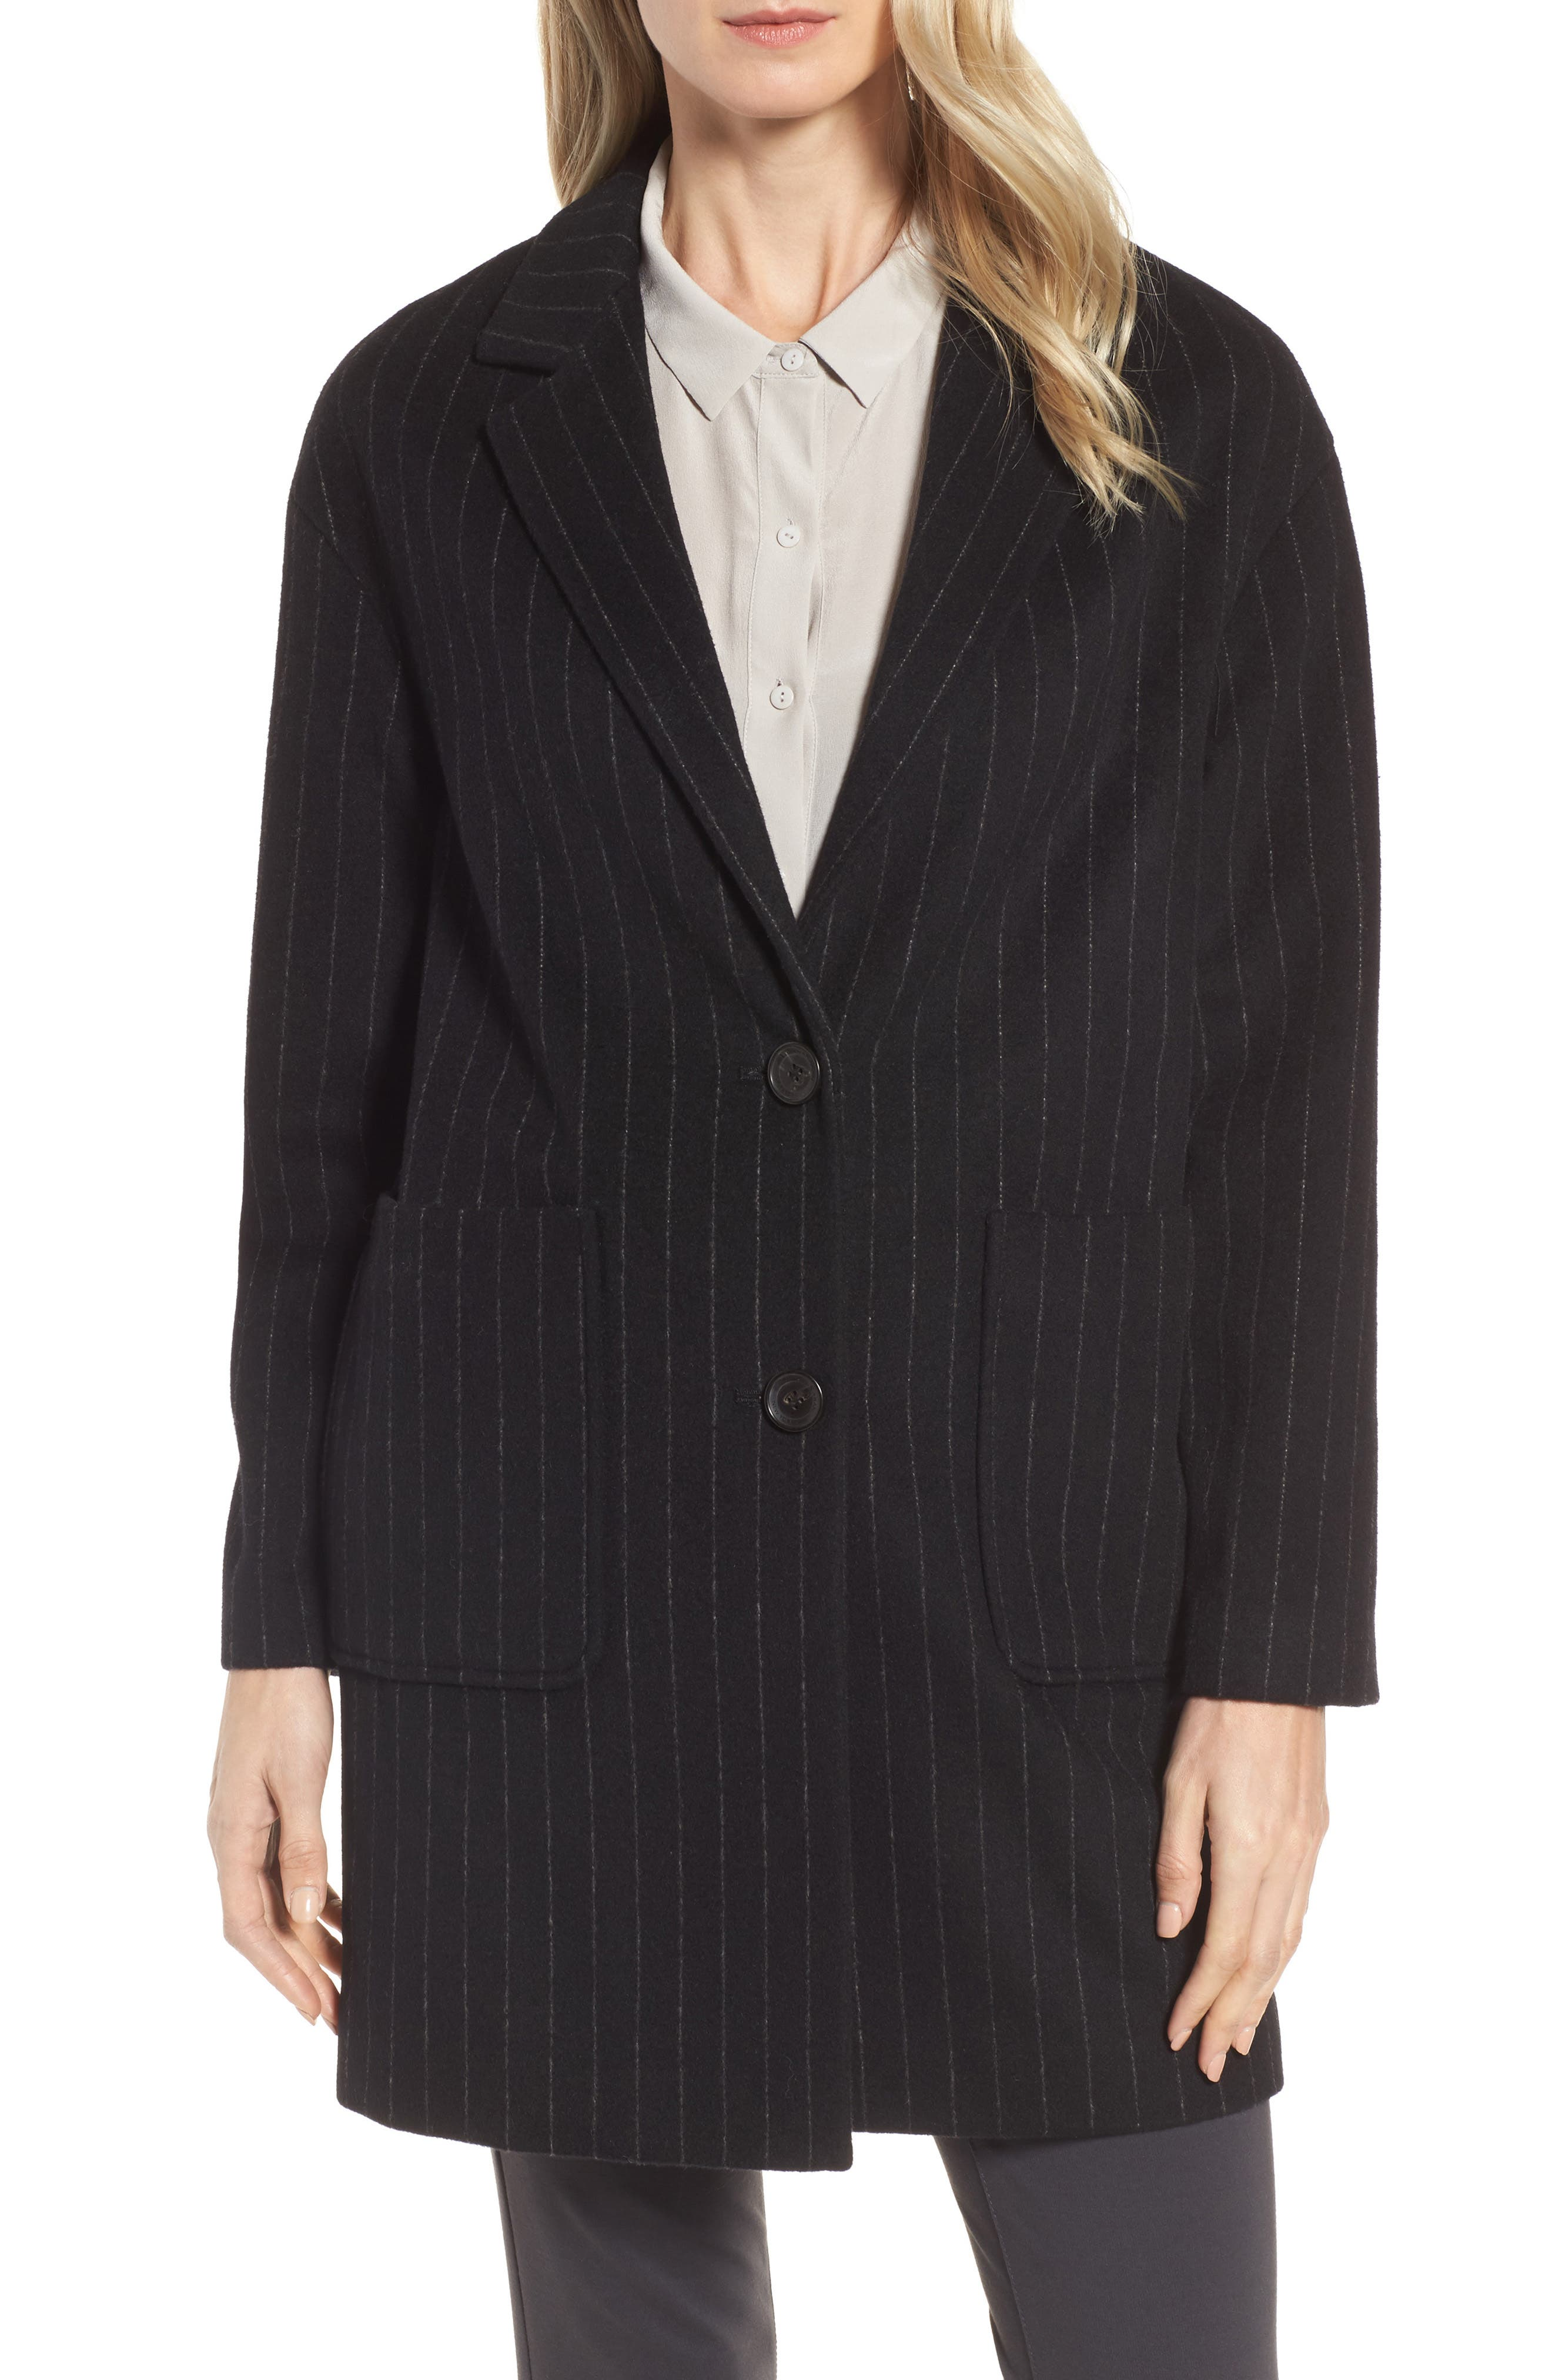 DKNY Pinstripe Wool Blend Coat,                         Main,                         color, Black